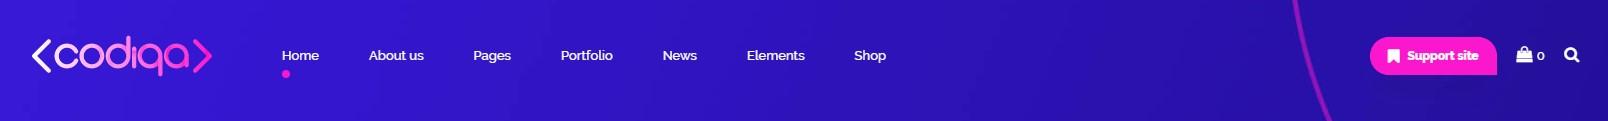 https://documentation.bold-themes.com/codiqa/wp-content/uploads/sites/49/2019/10/menu-horizontal-left.jpg